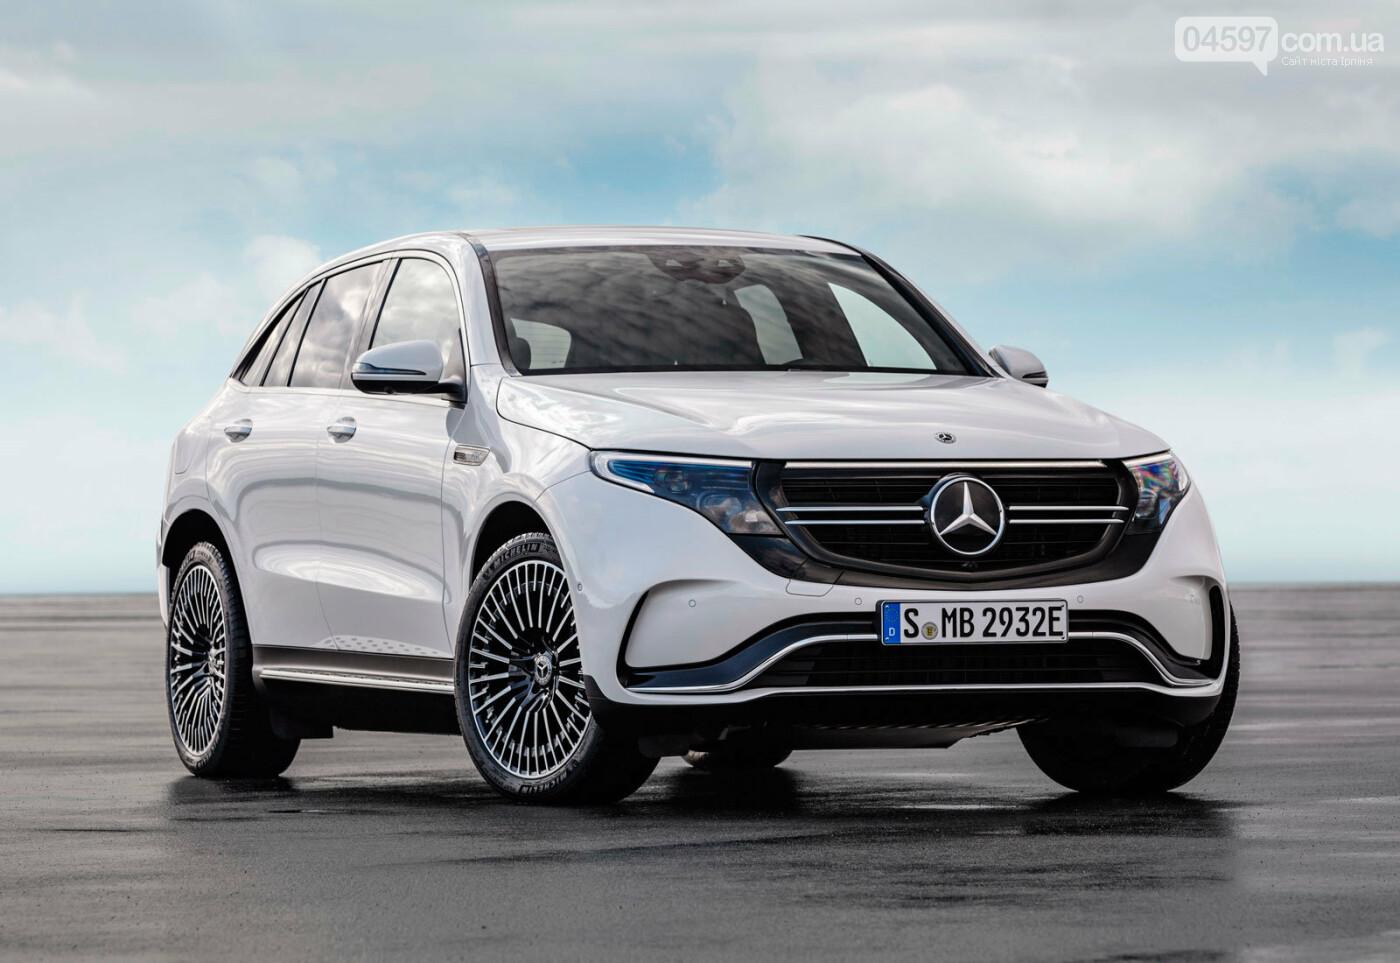 Донька мера Гостомеля купила авто за 100 тисяч євро, фото-1